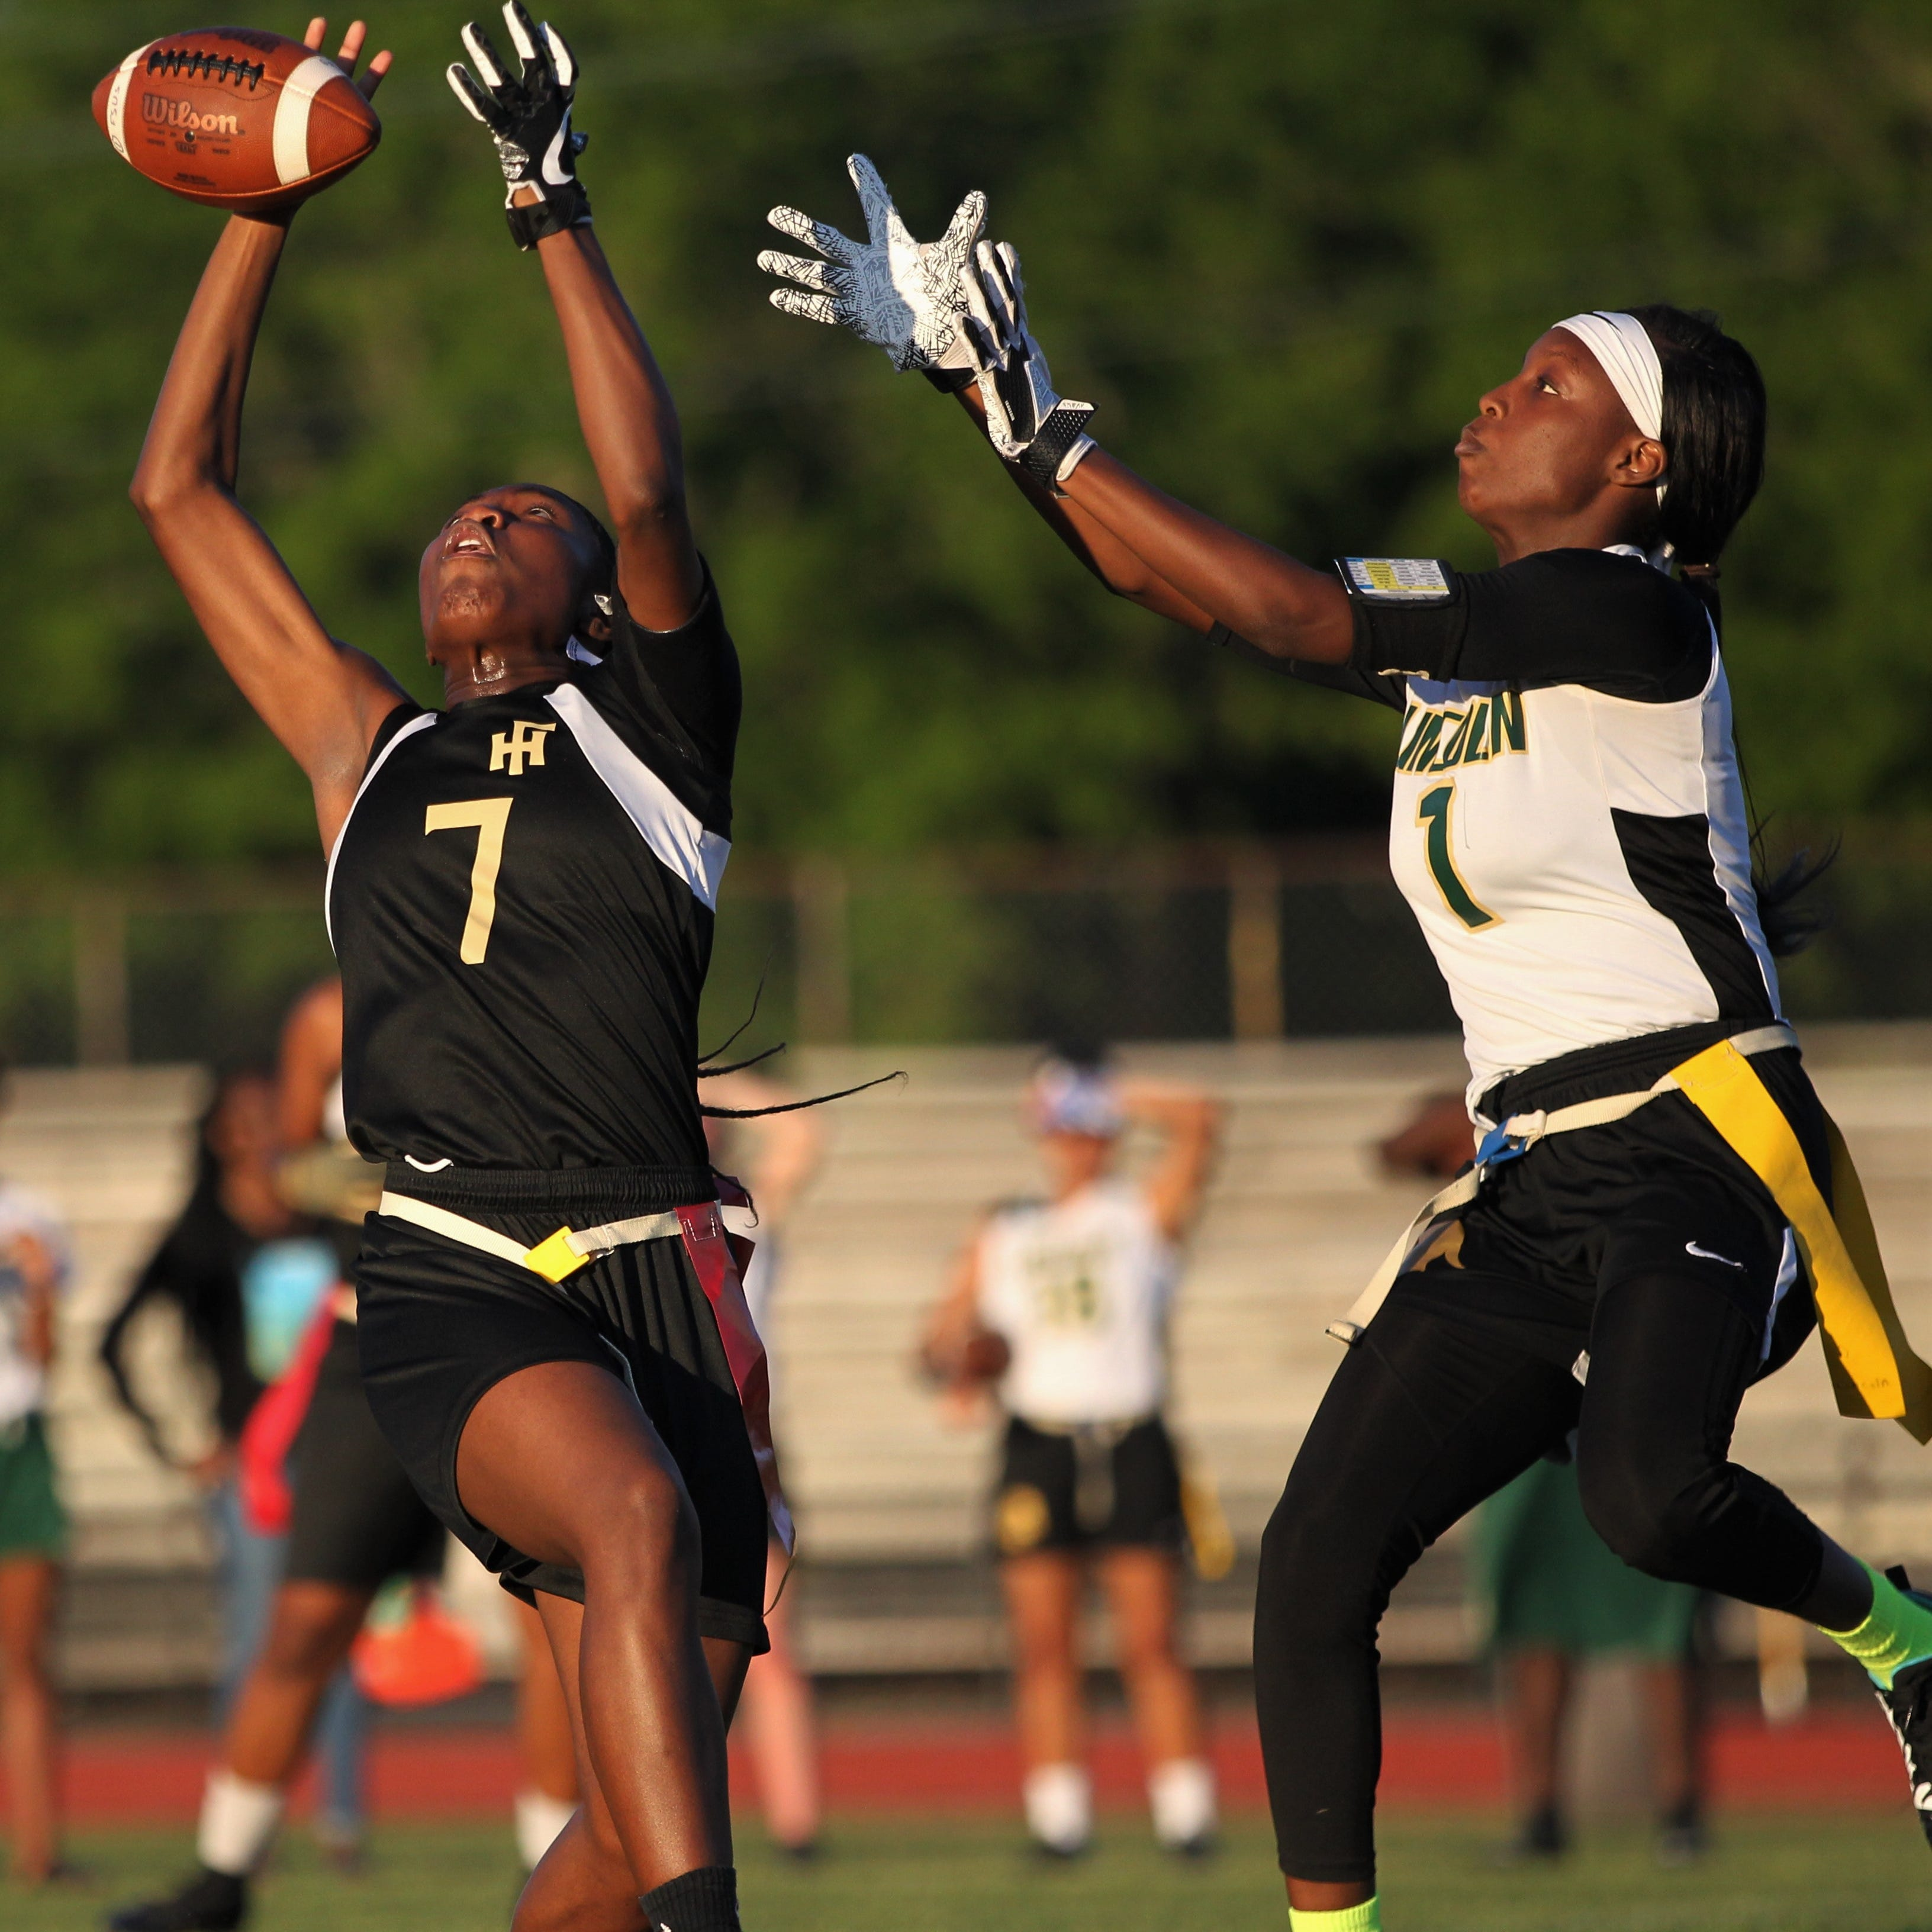 Lincoln upsets No. 6 Florida High, both teams make flag football district playoffs